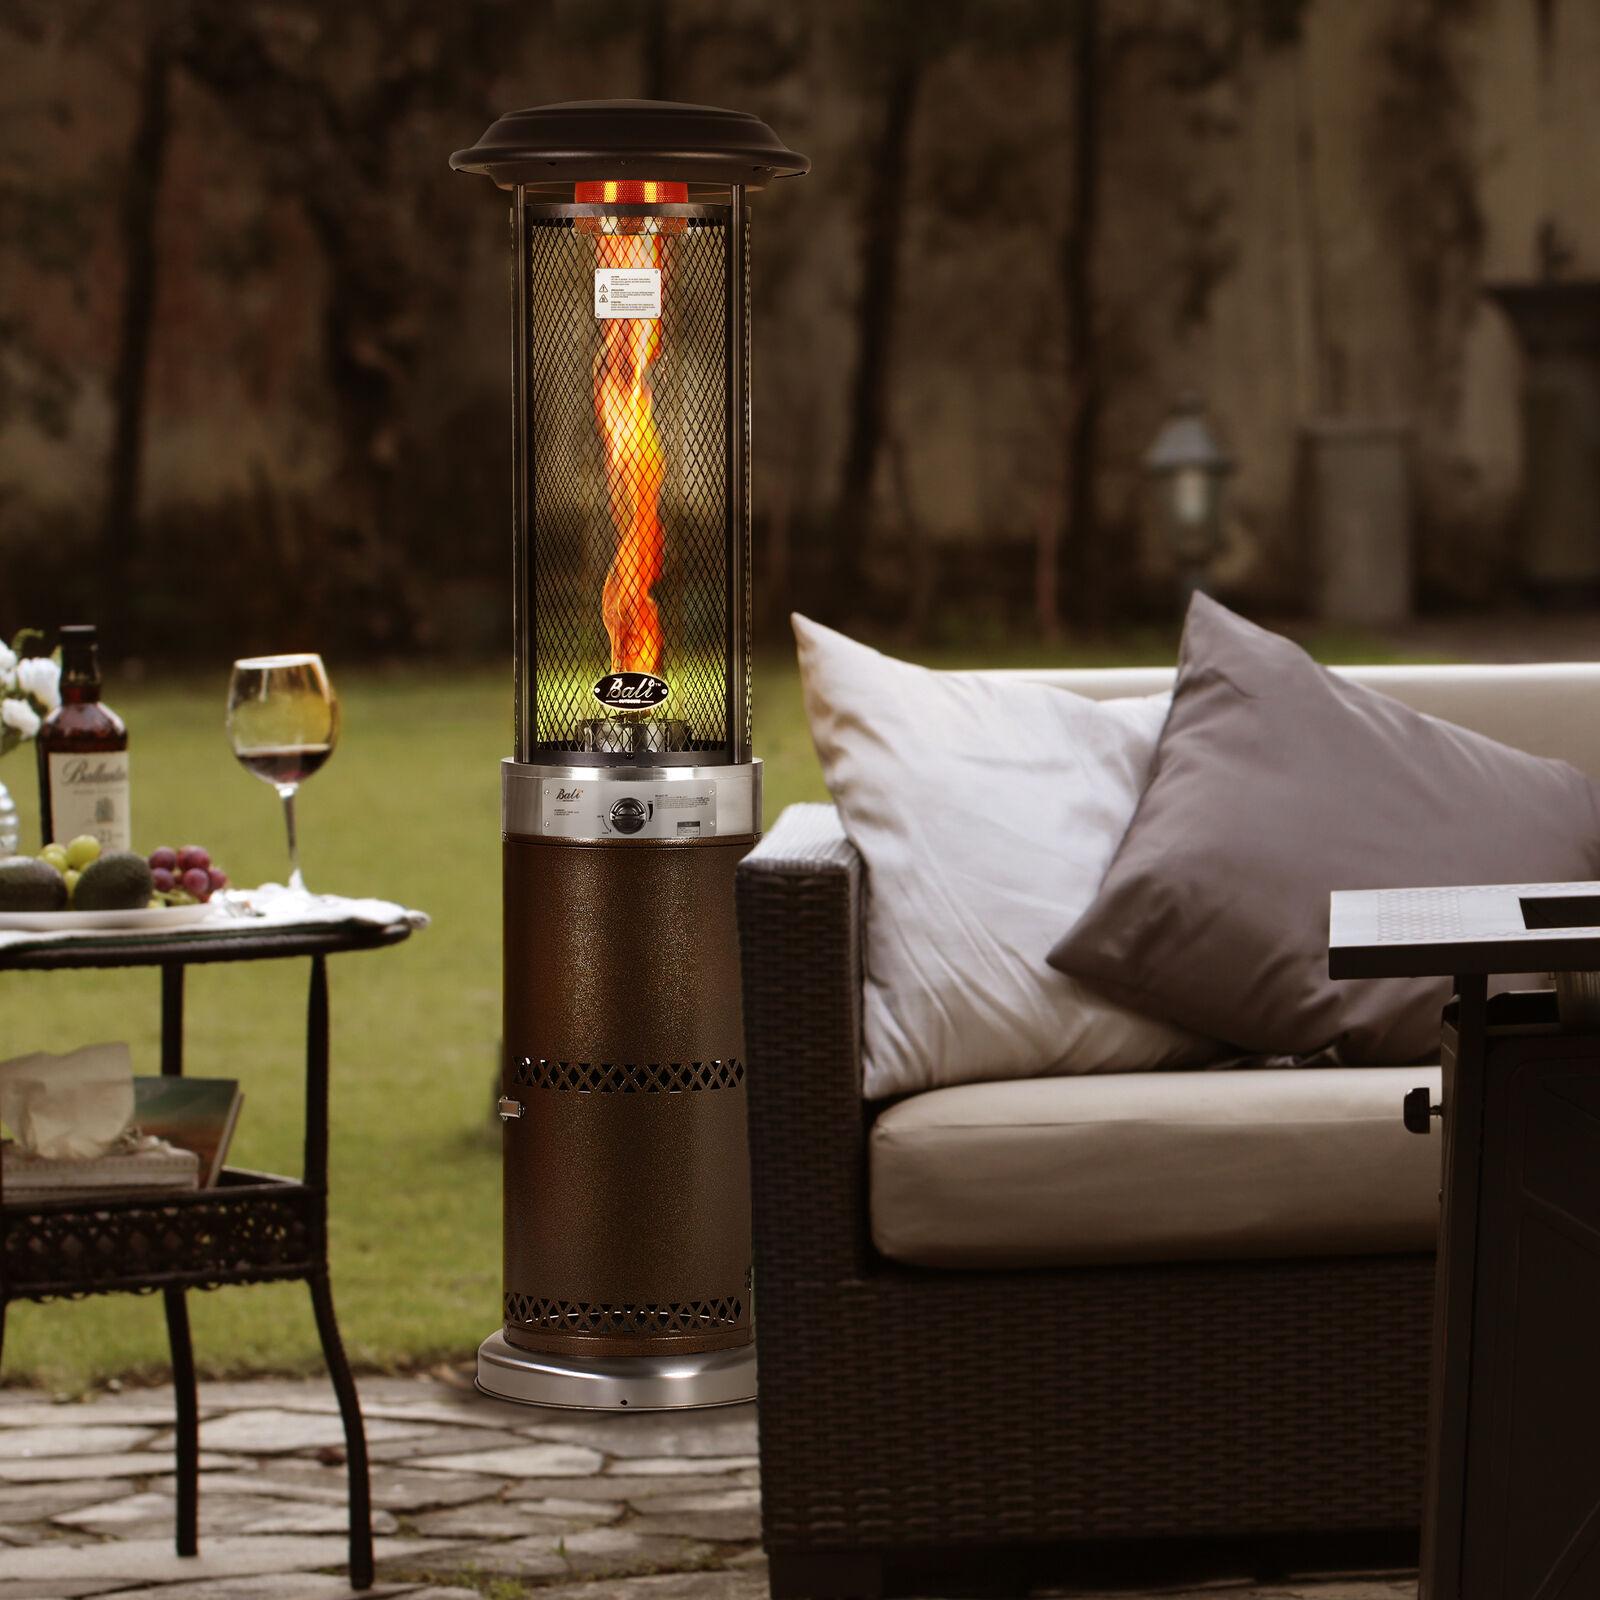 Bali Outdoors 36000BTU Commercial Outdoor LP Propane Gas Patio Heater